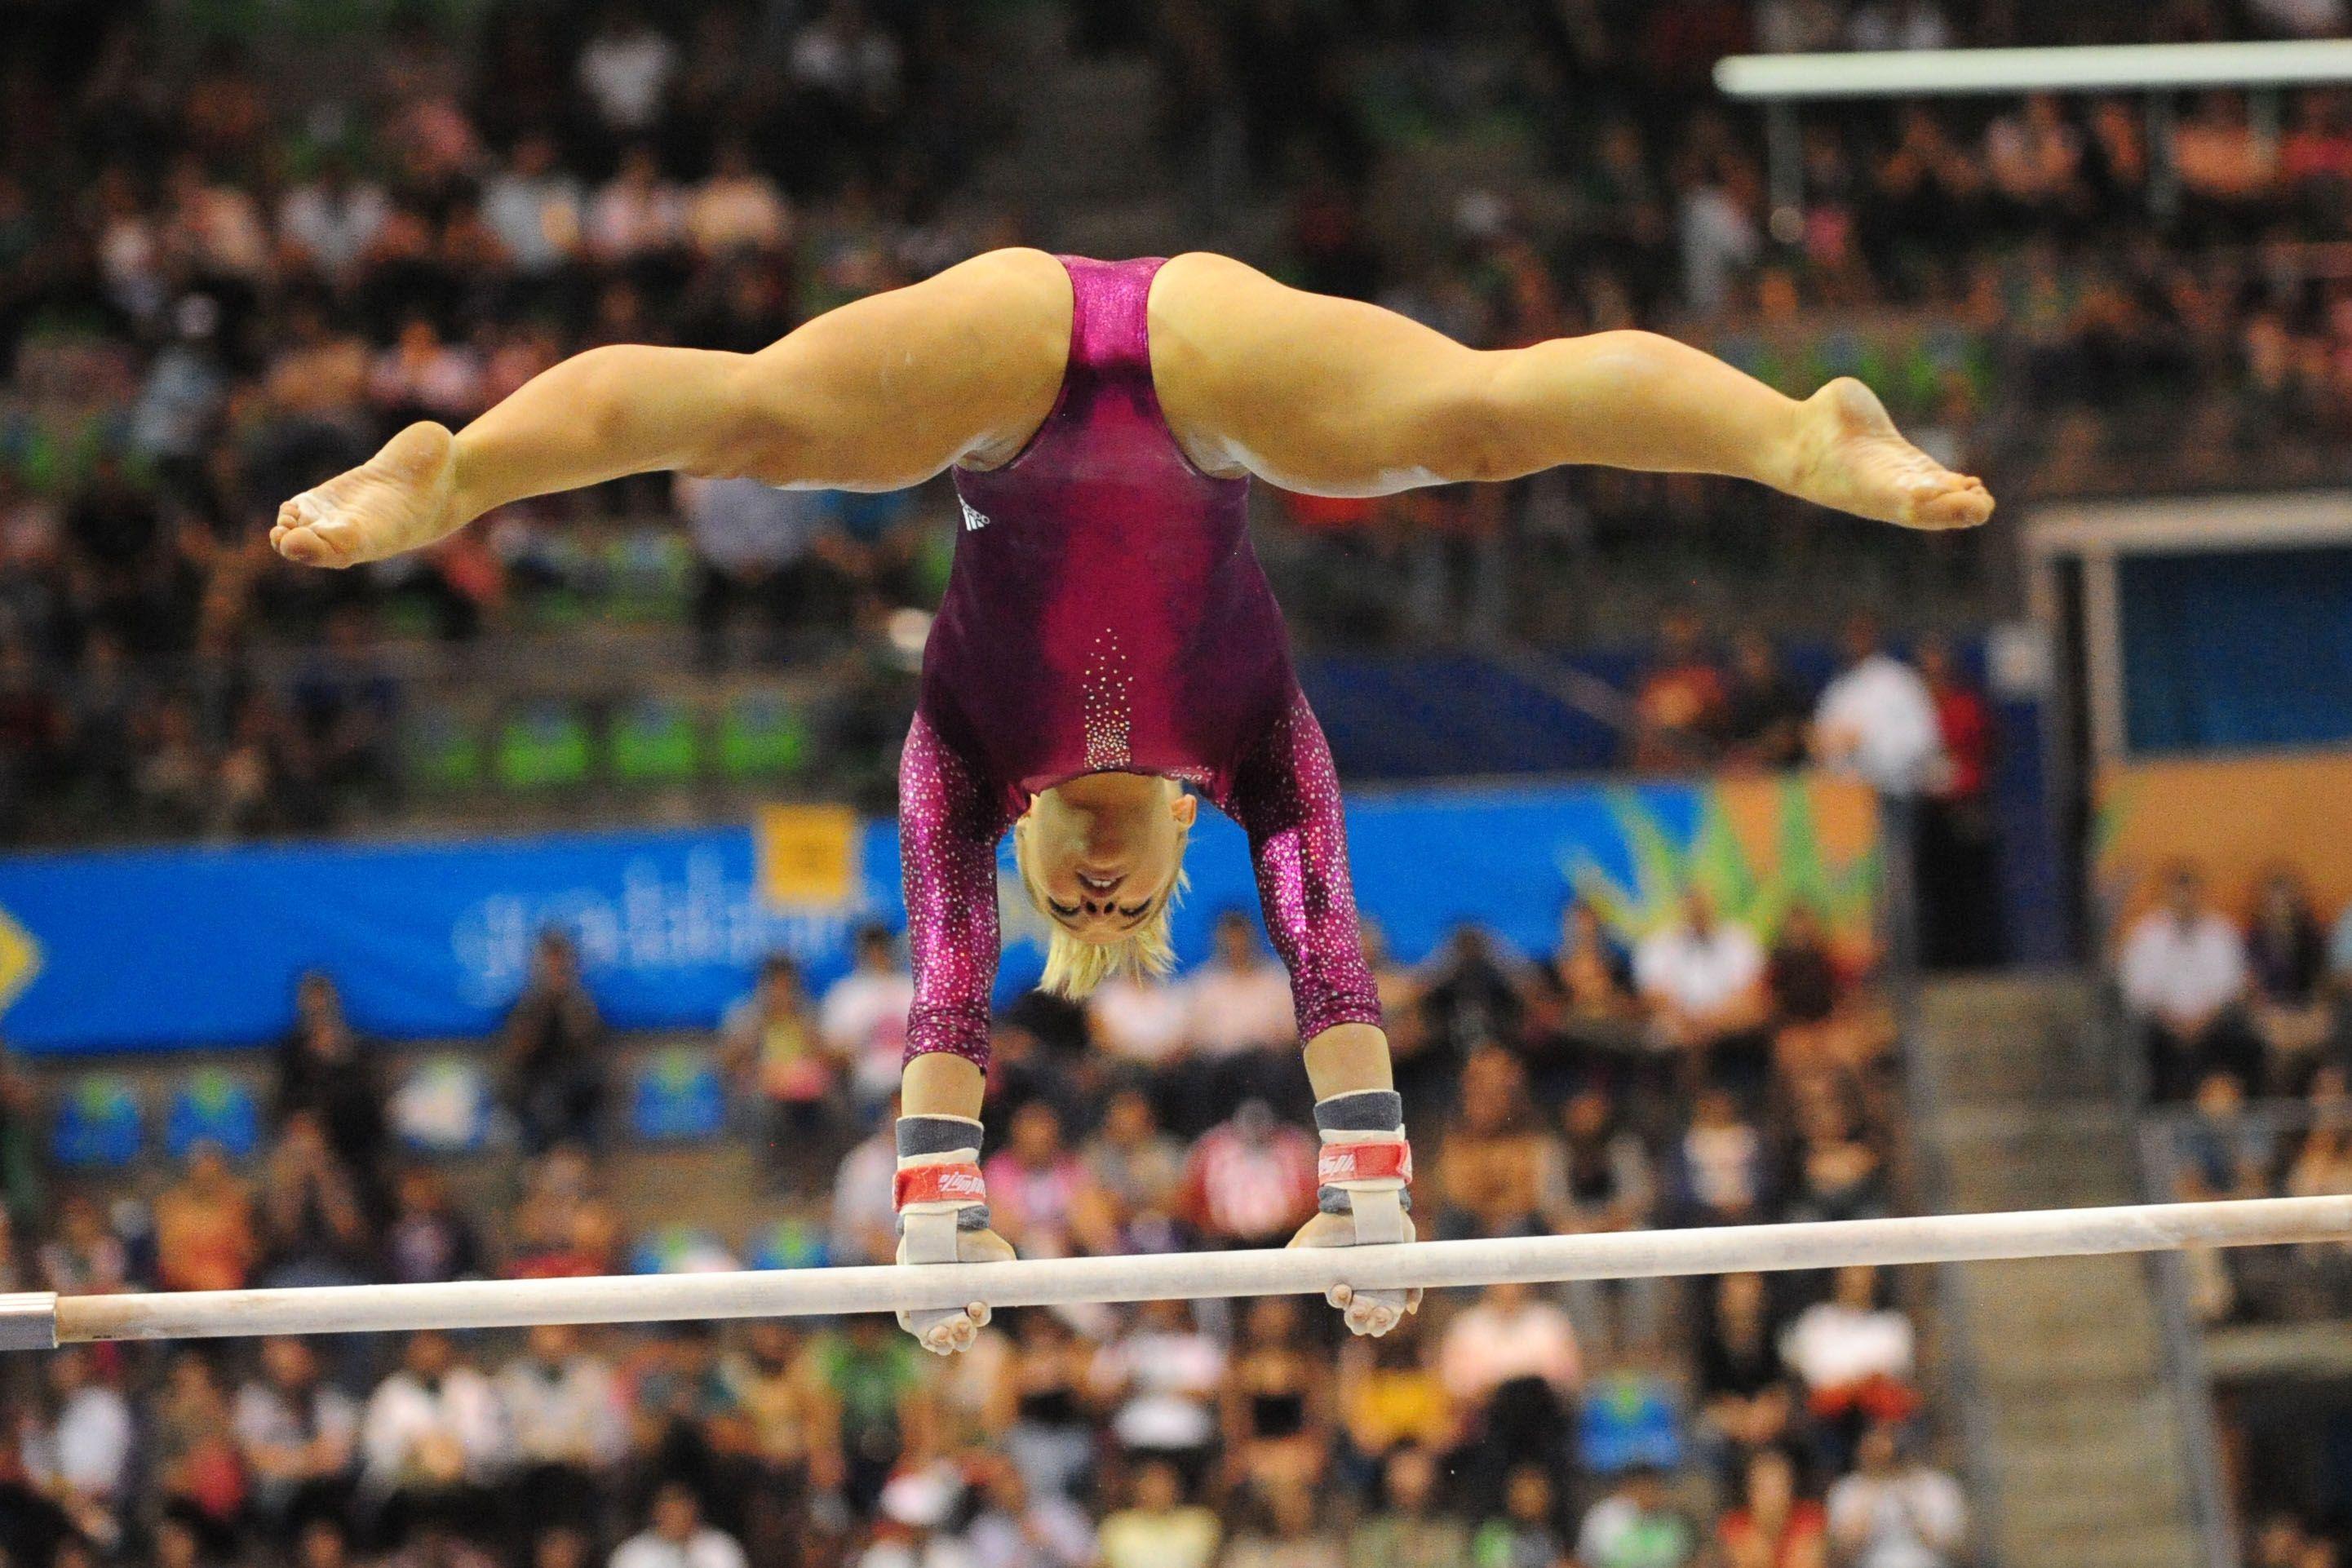 Female gymnasts nude